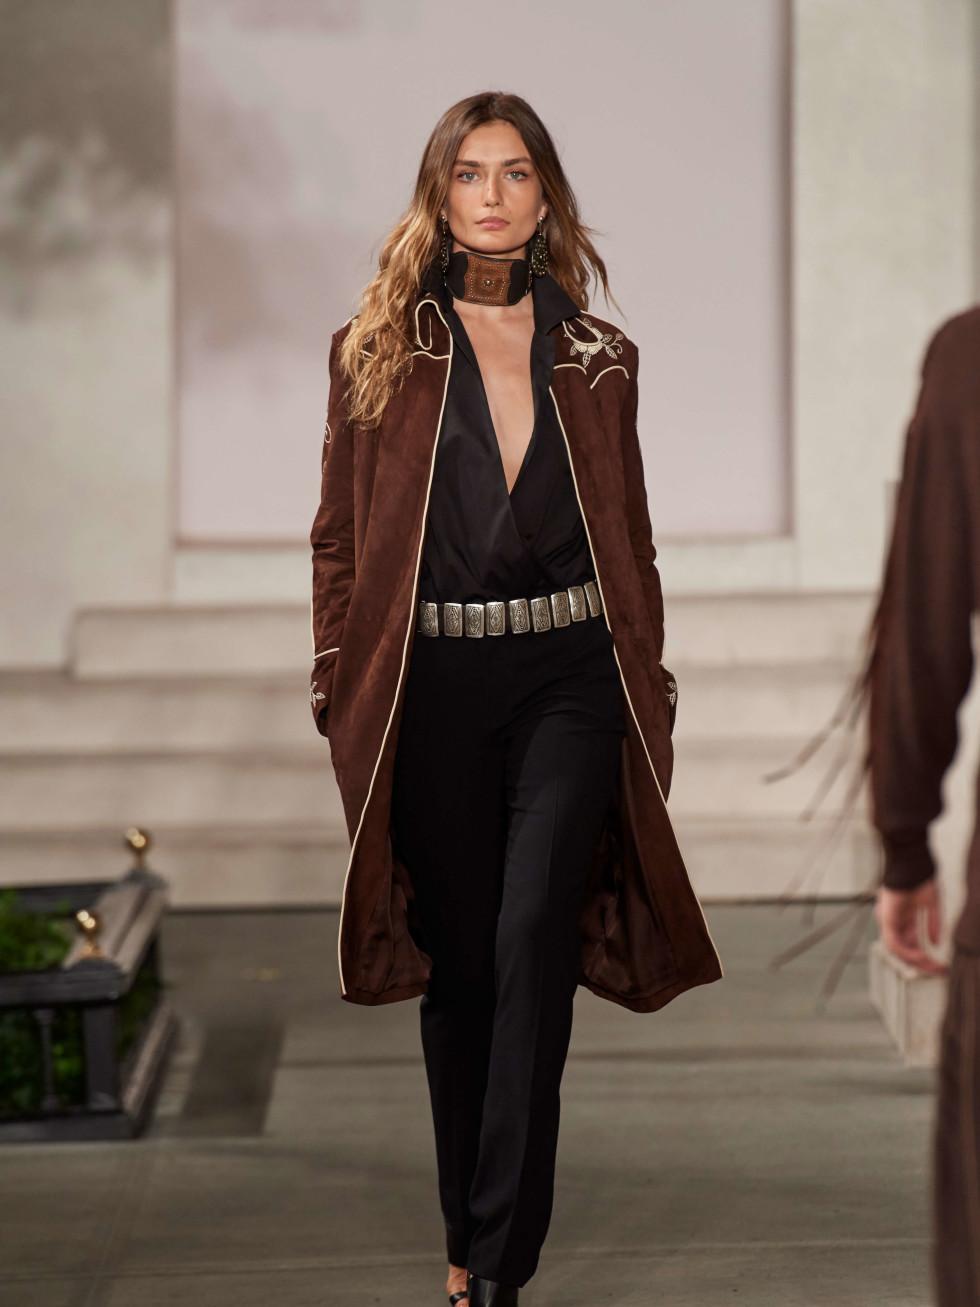 Ralph Lauren fall collection Houston coat